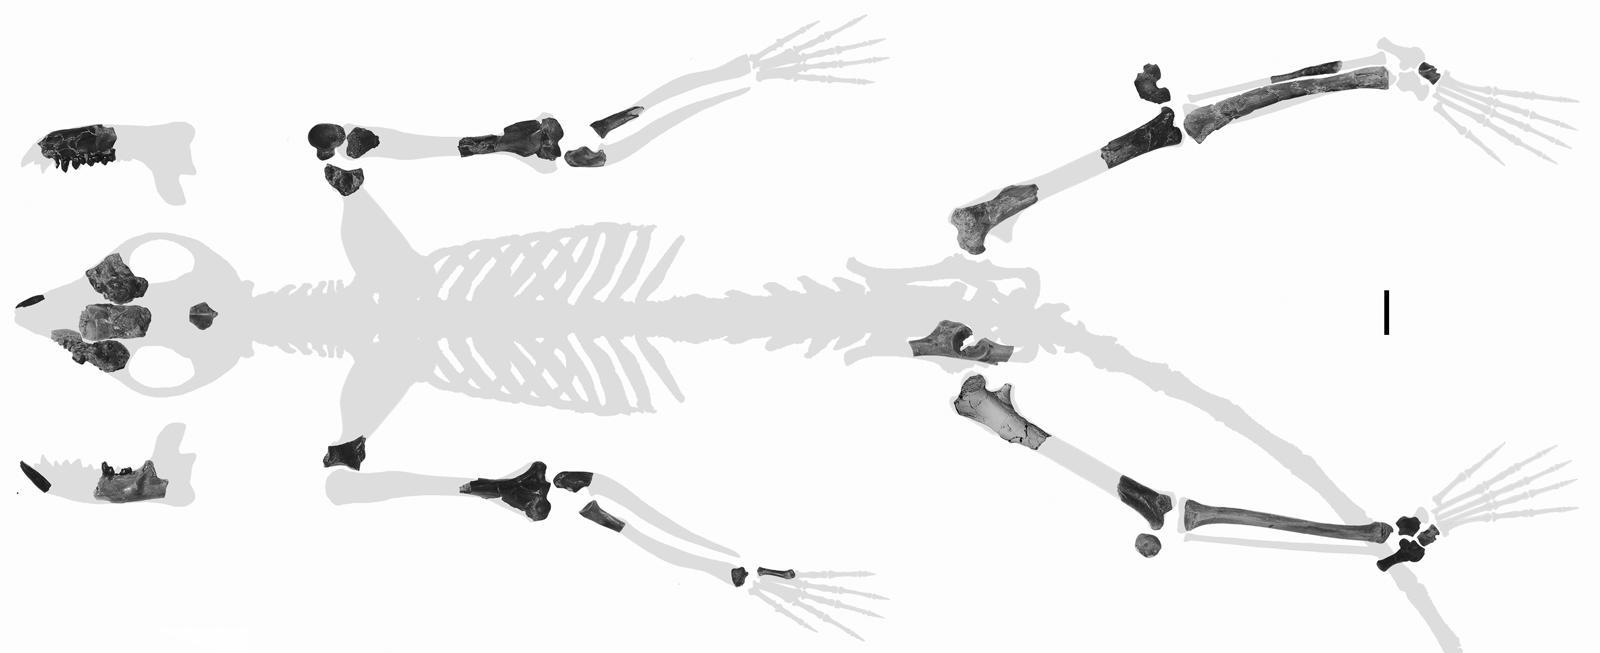 Torrejonia skeleton fragments